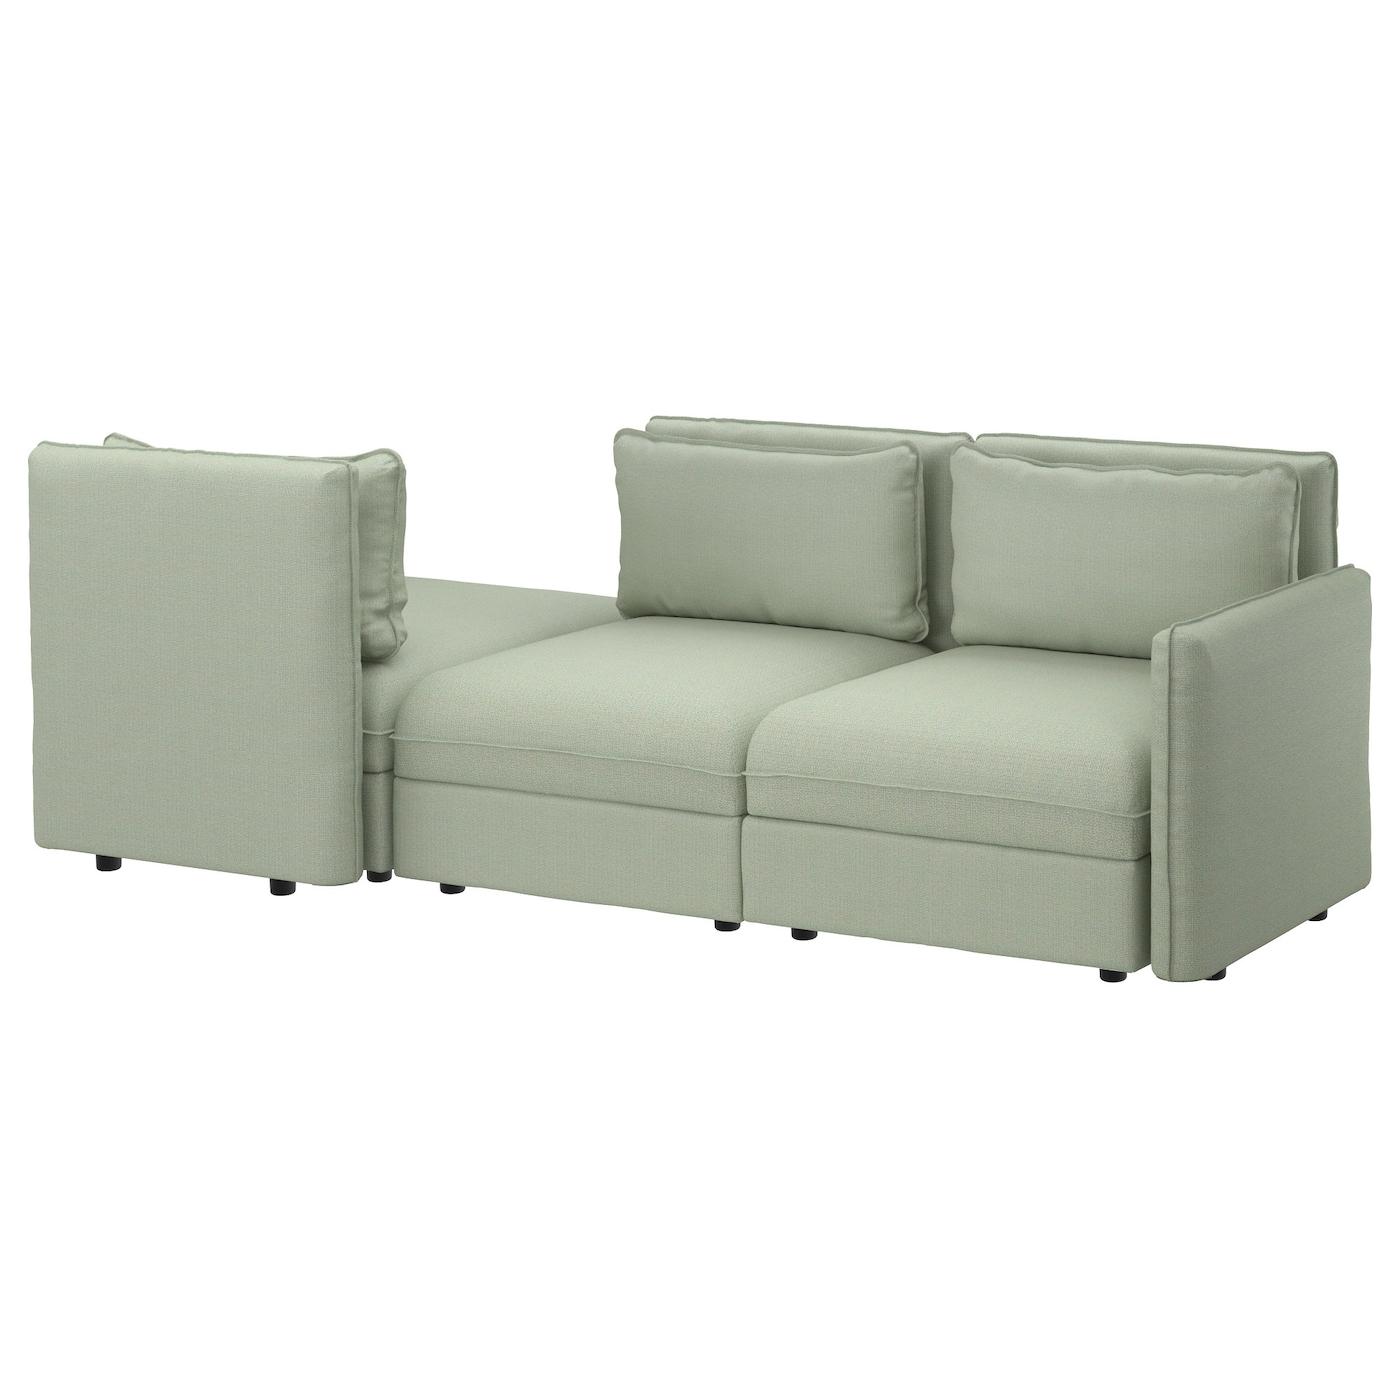 Ikea Vallentuna 3 Seat Sofa 10 Year Guarantee Read About The Terms In